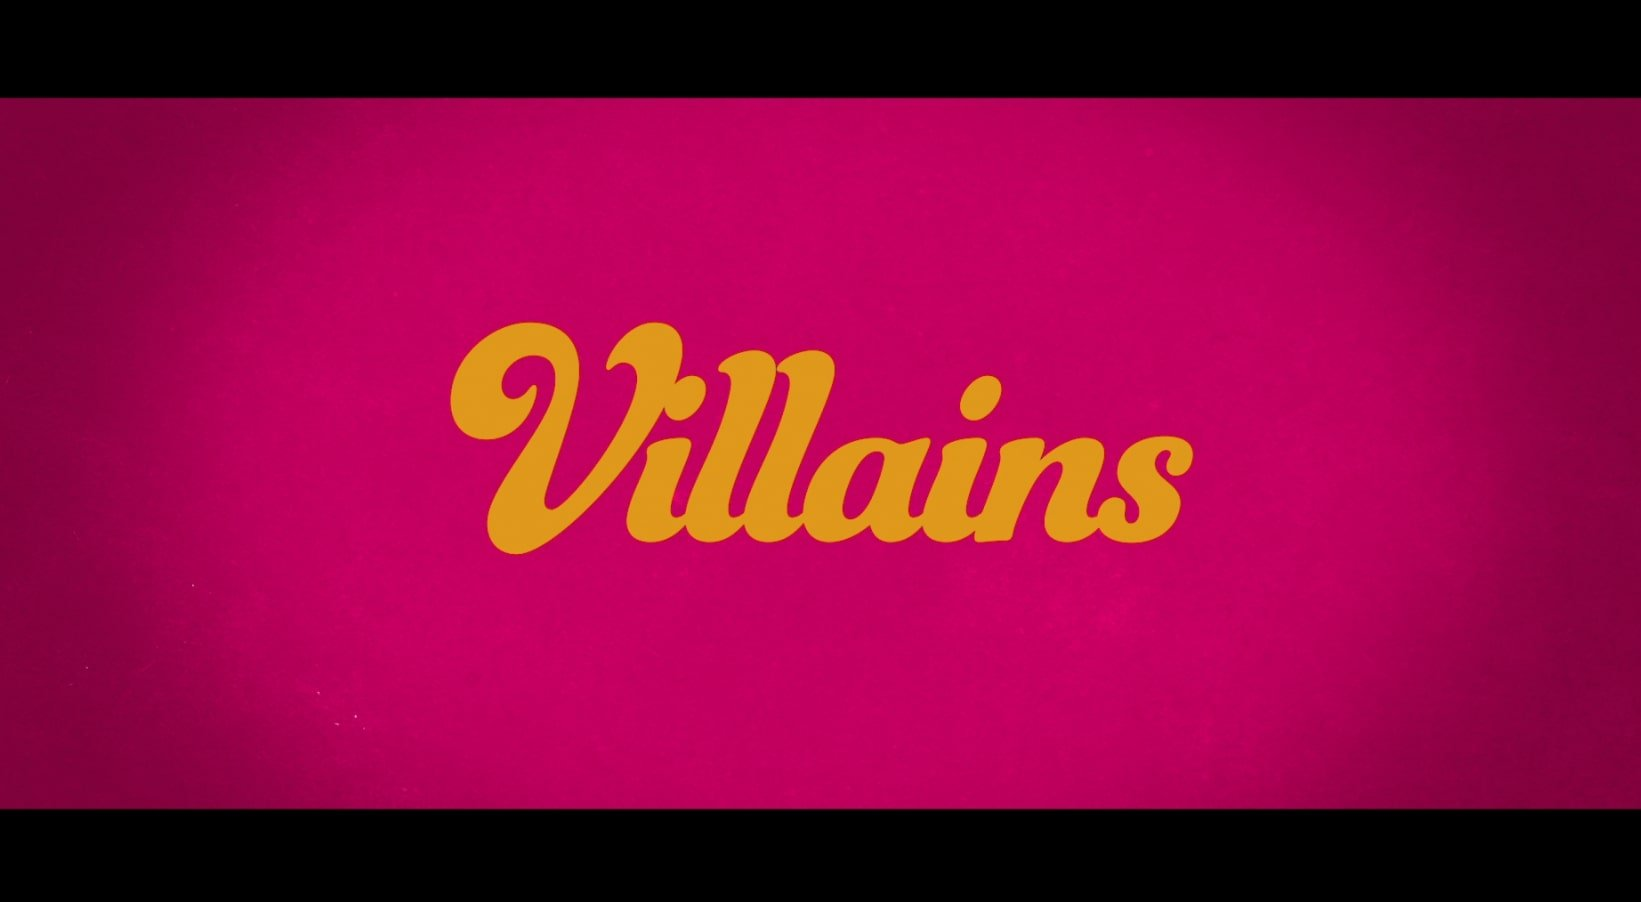 Thumbnail for Villians